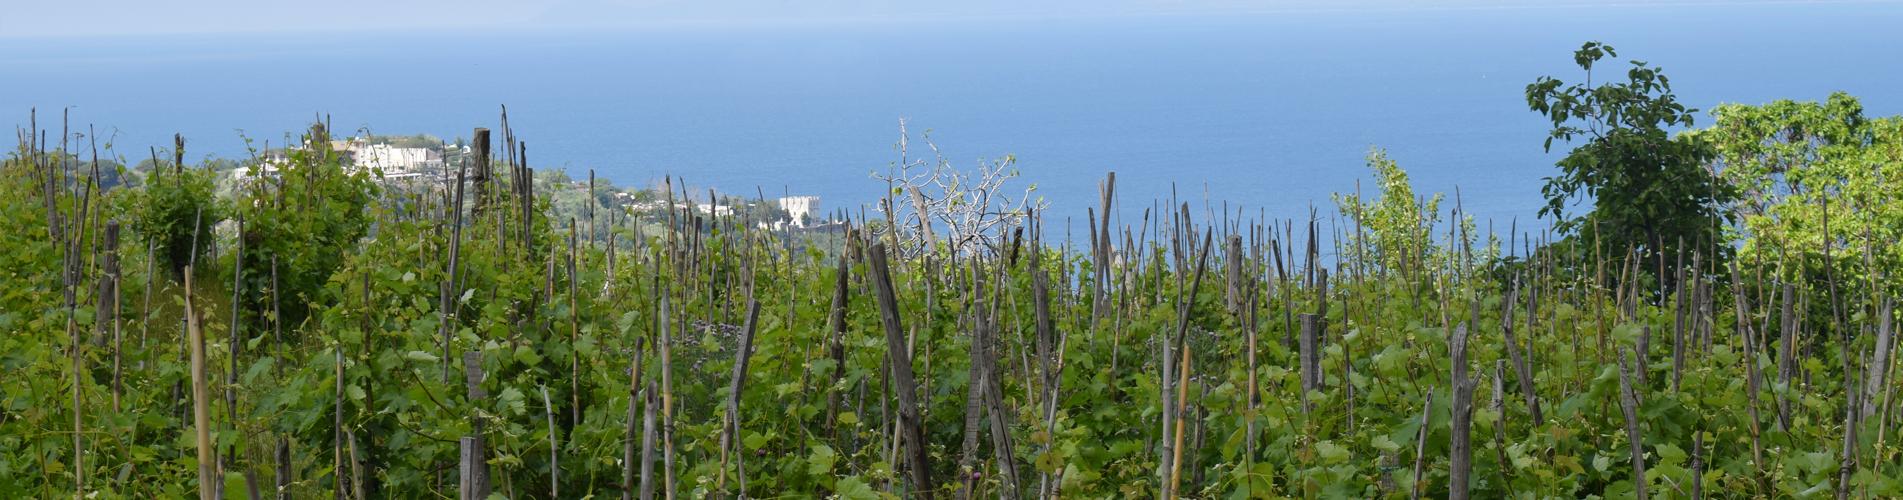 Wanderferien in Ischia und übernachten im Casa Di Meglio in Casamicciola Terme